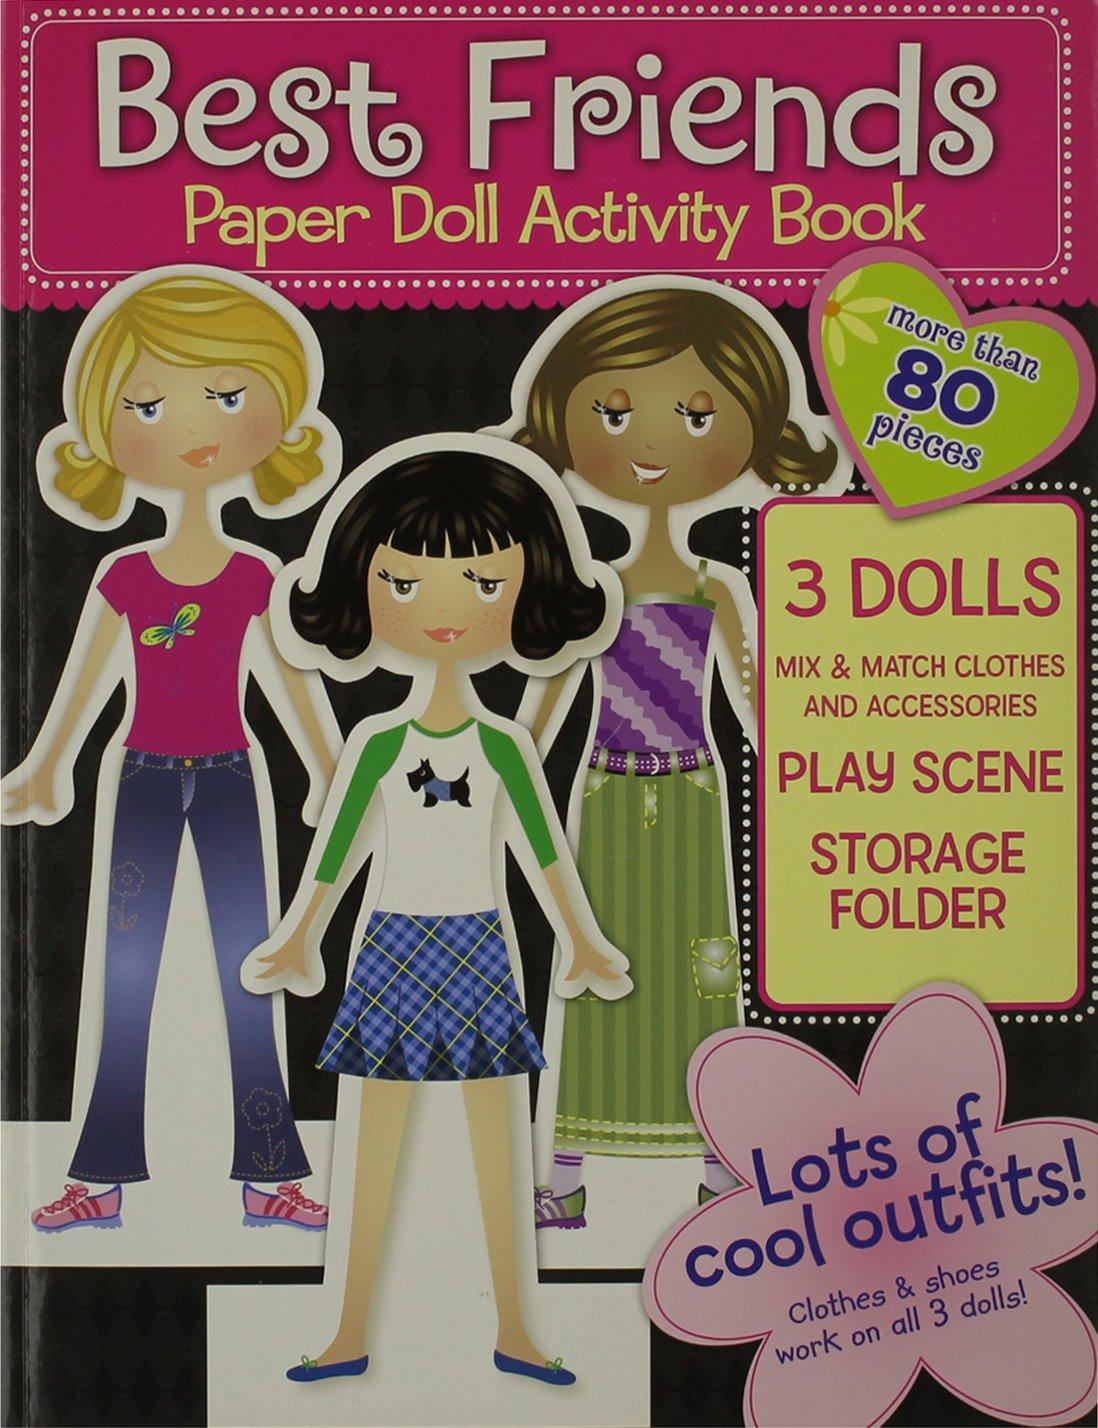 Best Friends Paper Doll Activity Book